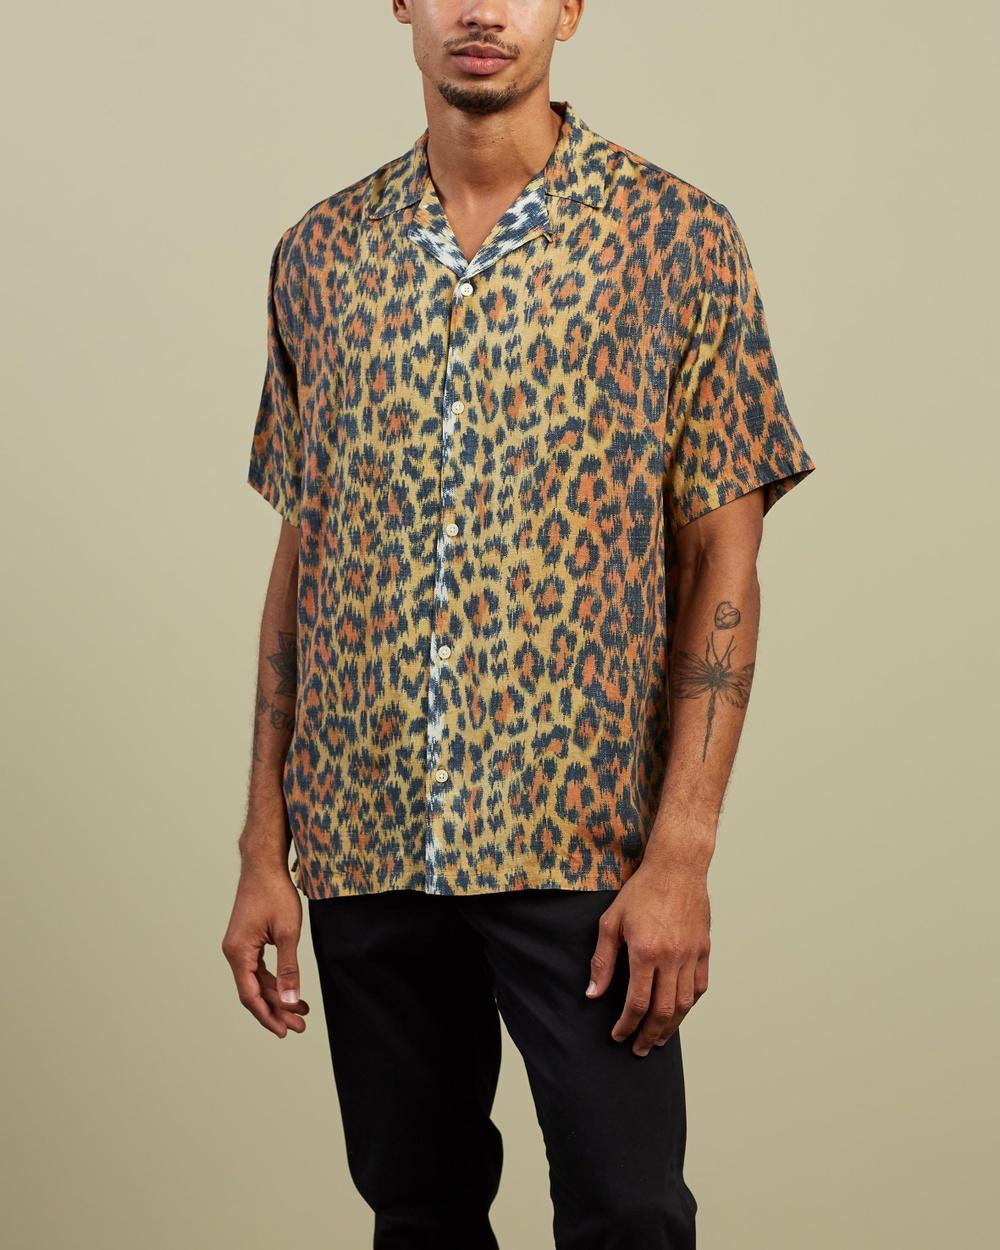 AllSaints Colt Short Sleeve Shirt Casual shirts Yellow